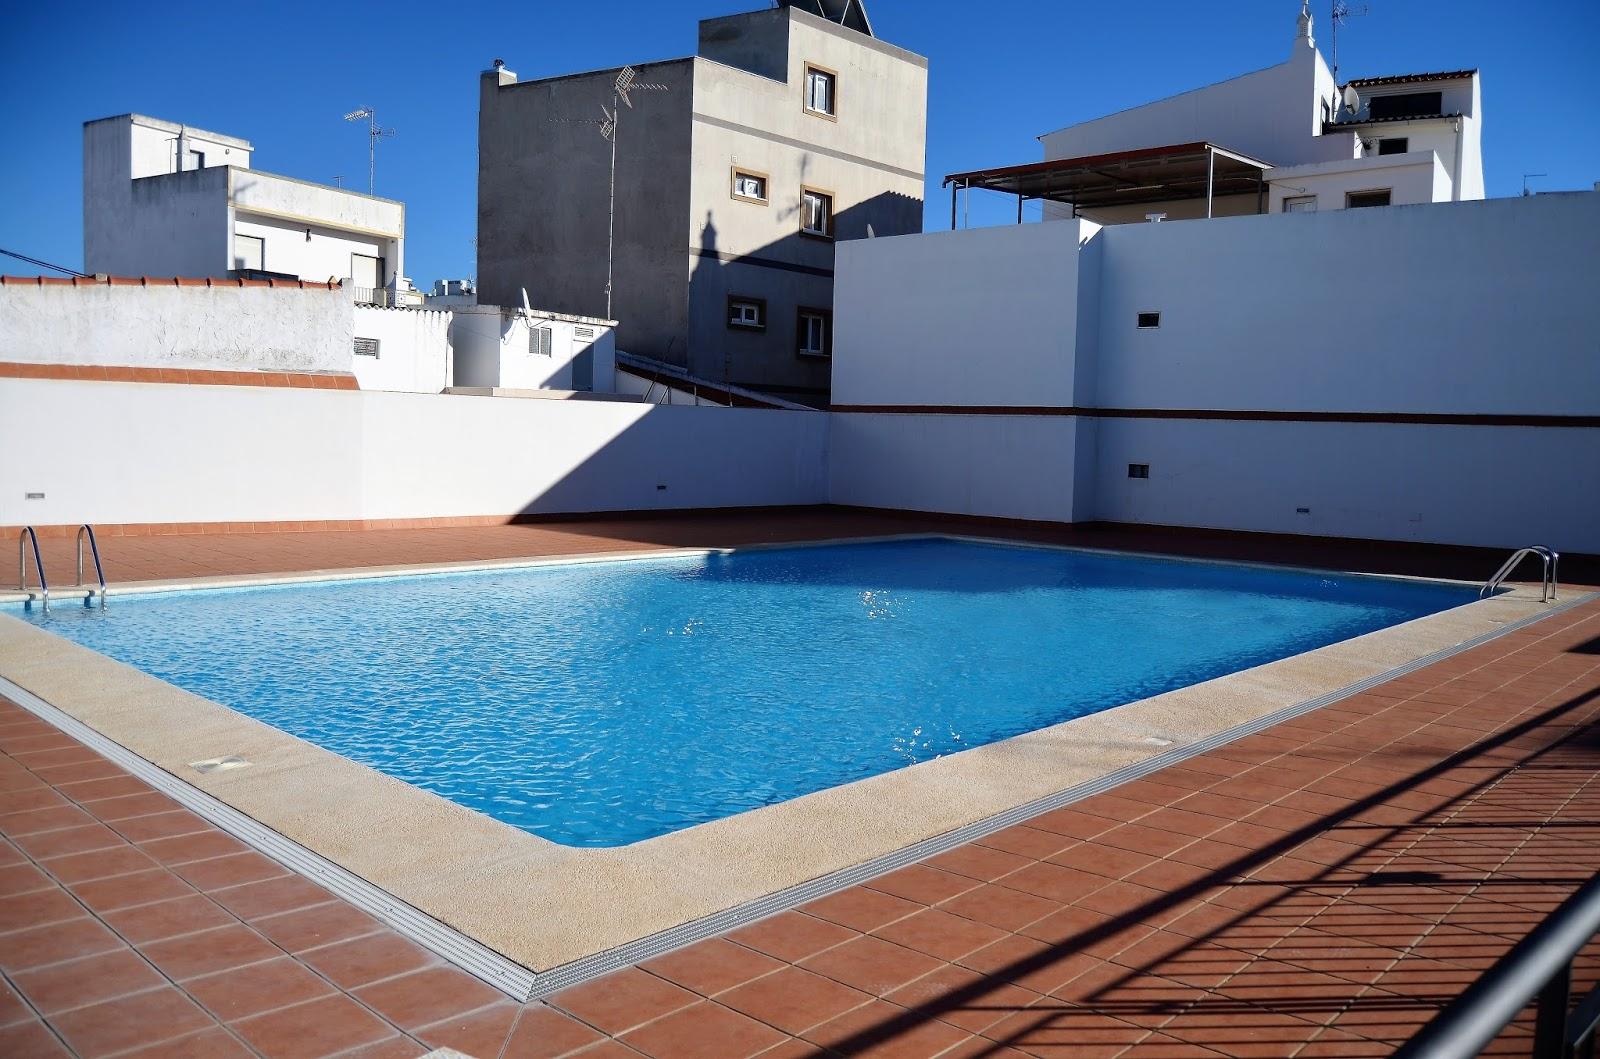 2 bedroom apartment in Algarve